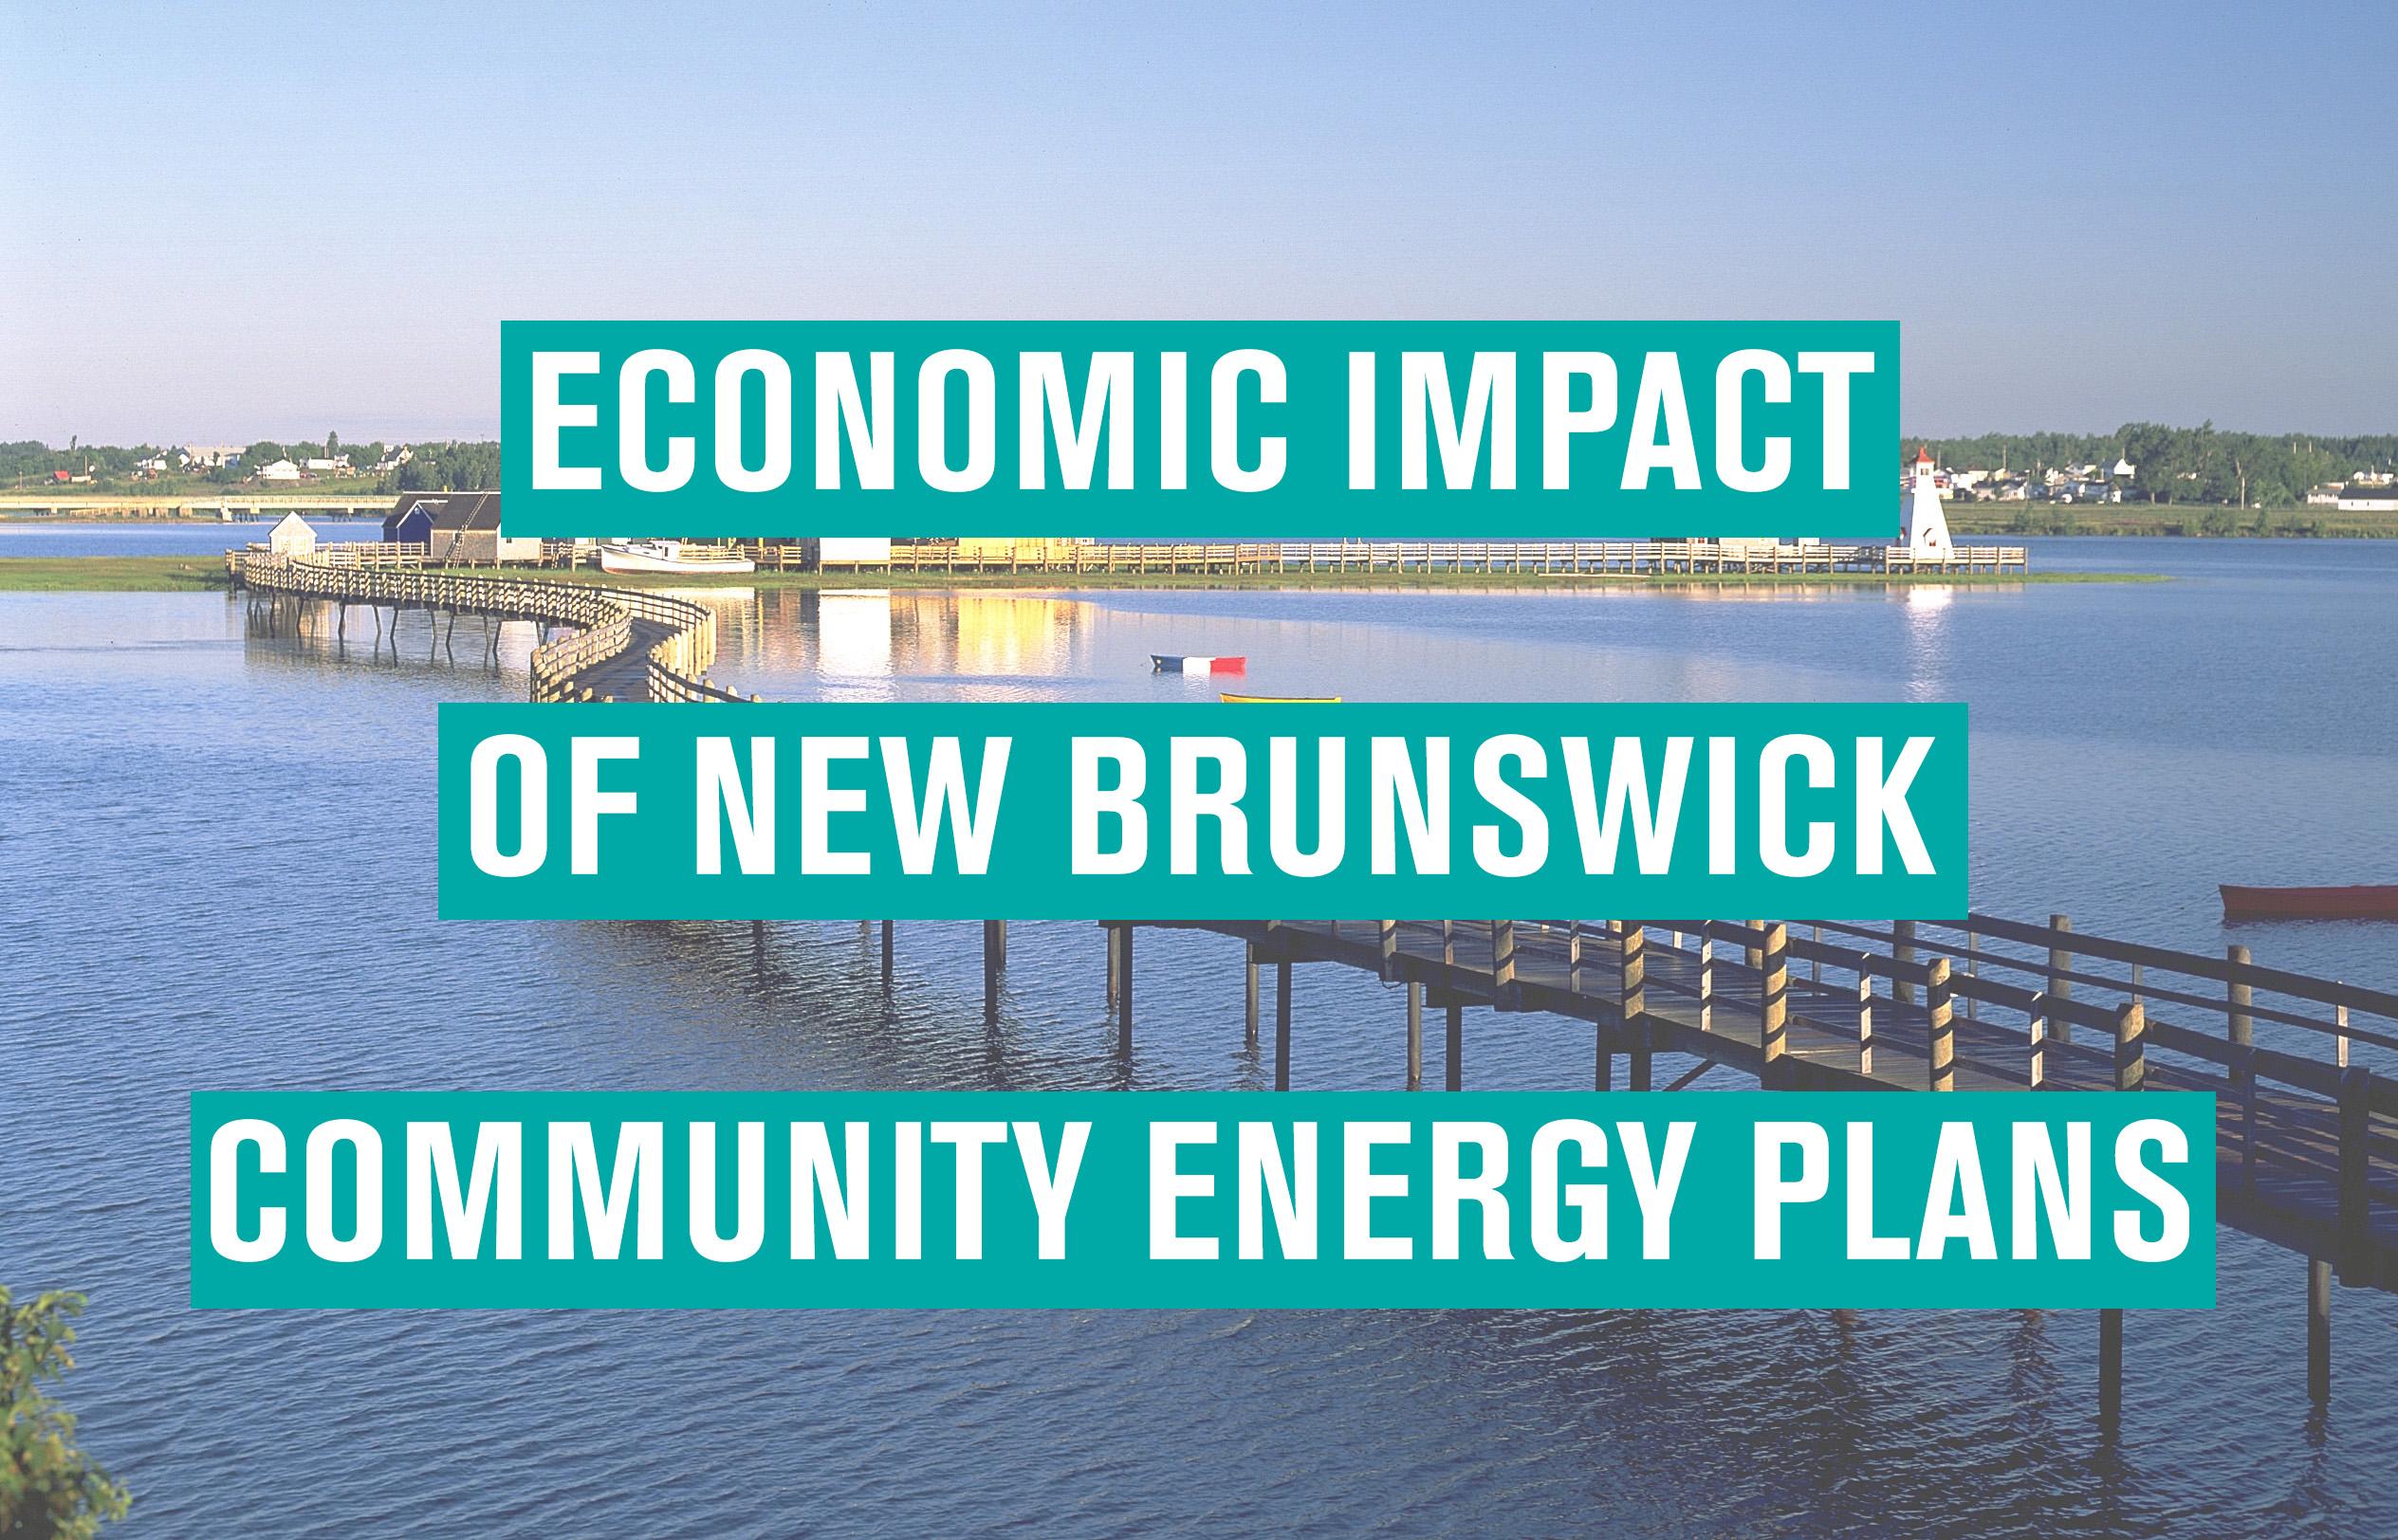 Economic Impact of New Brunswick Community Energy Plans